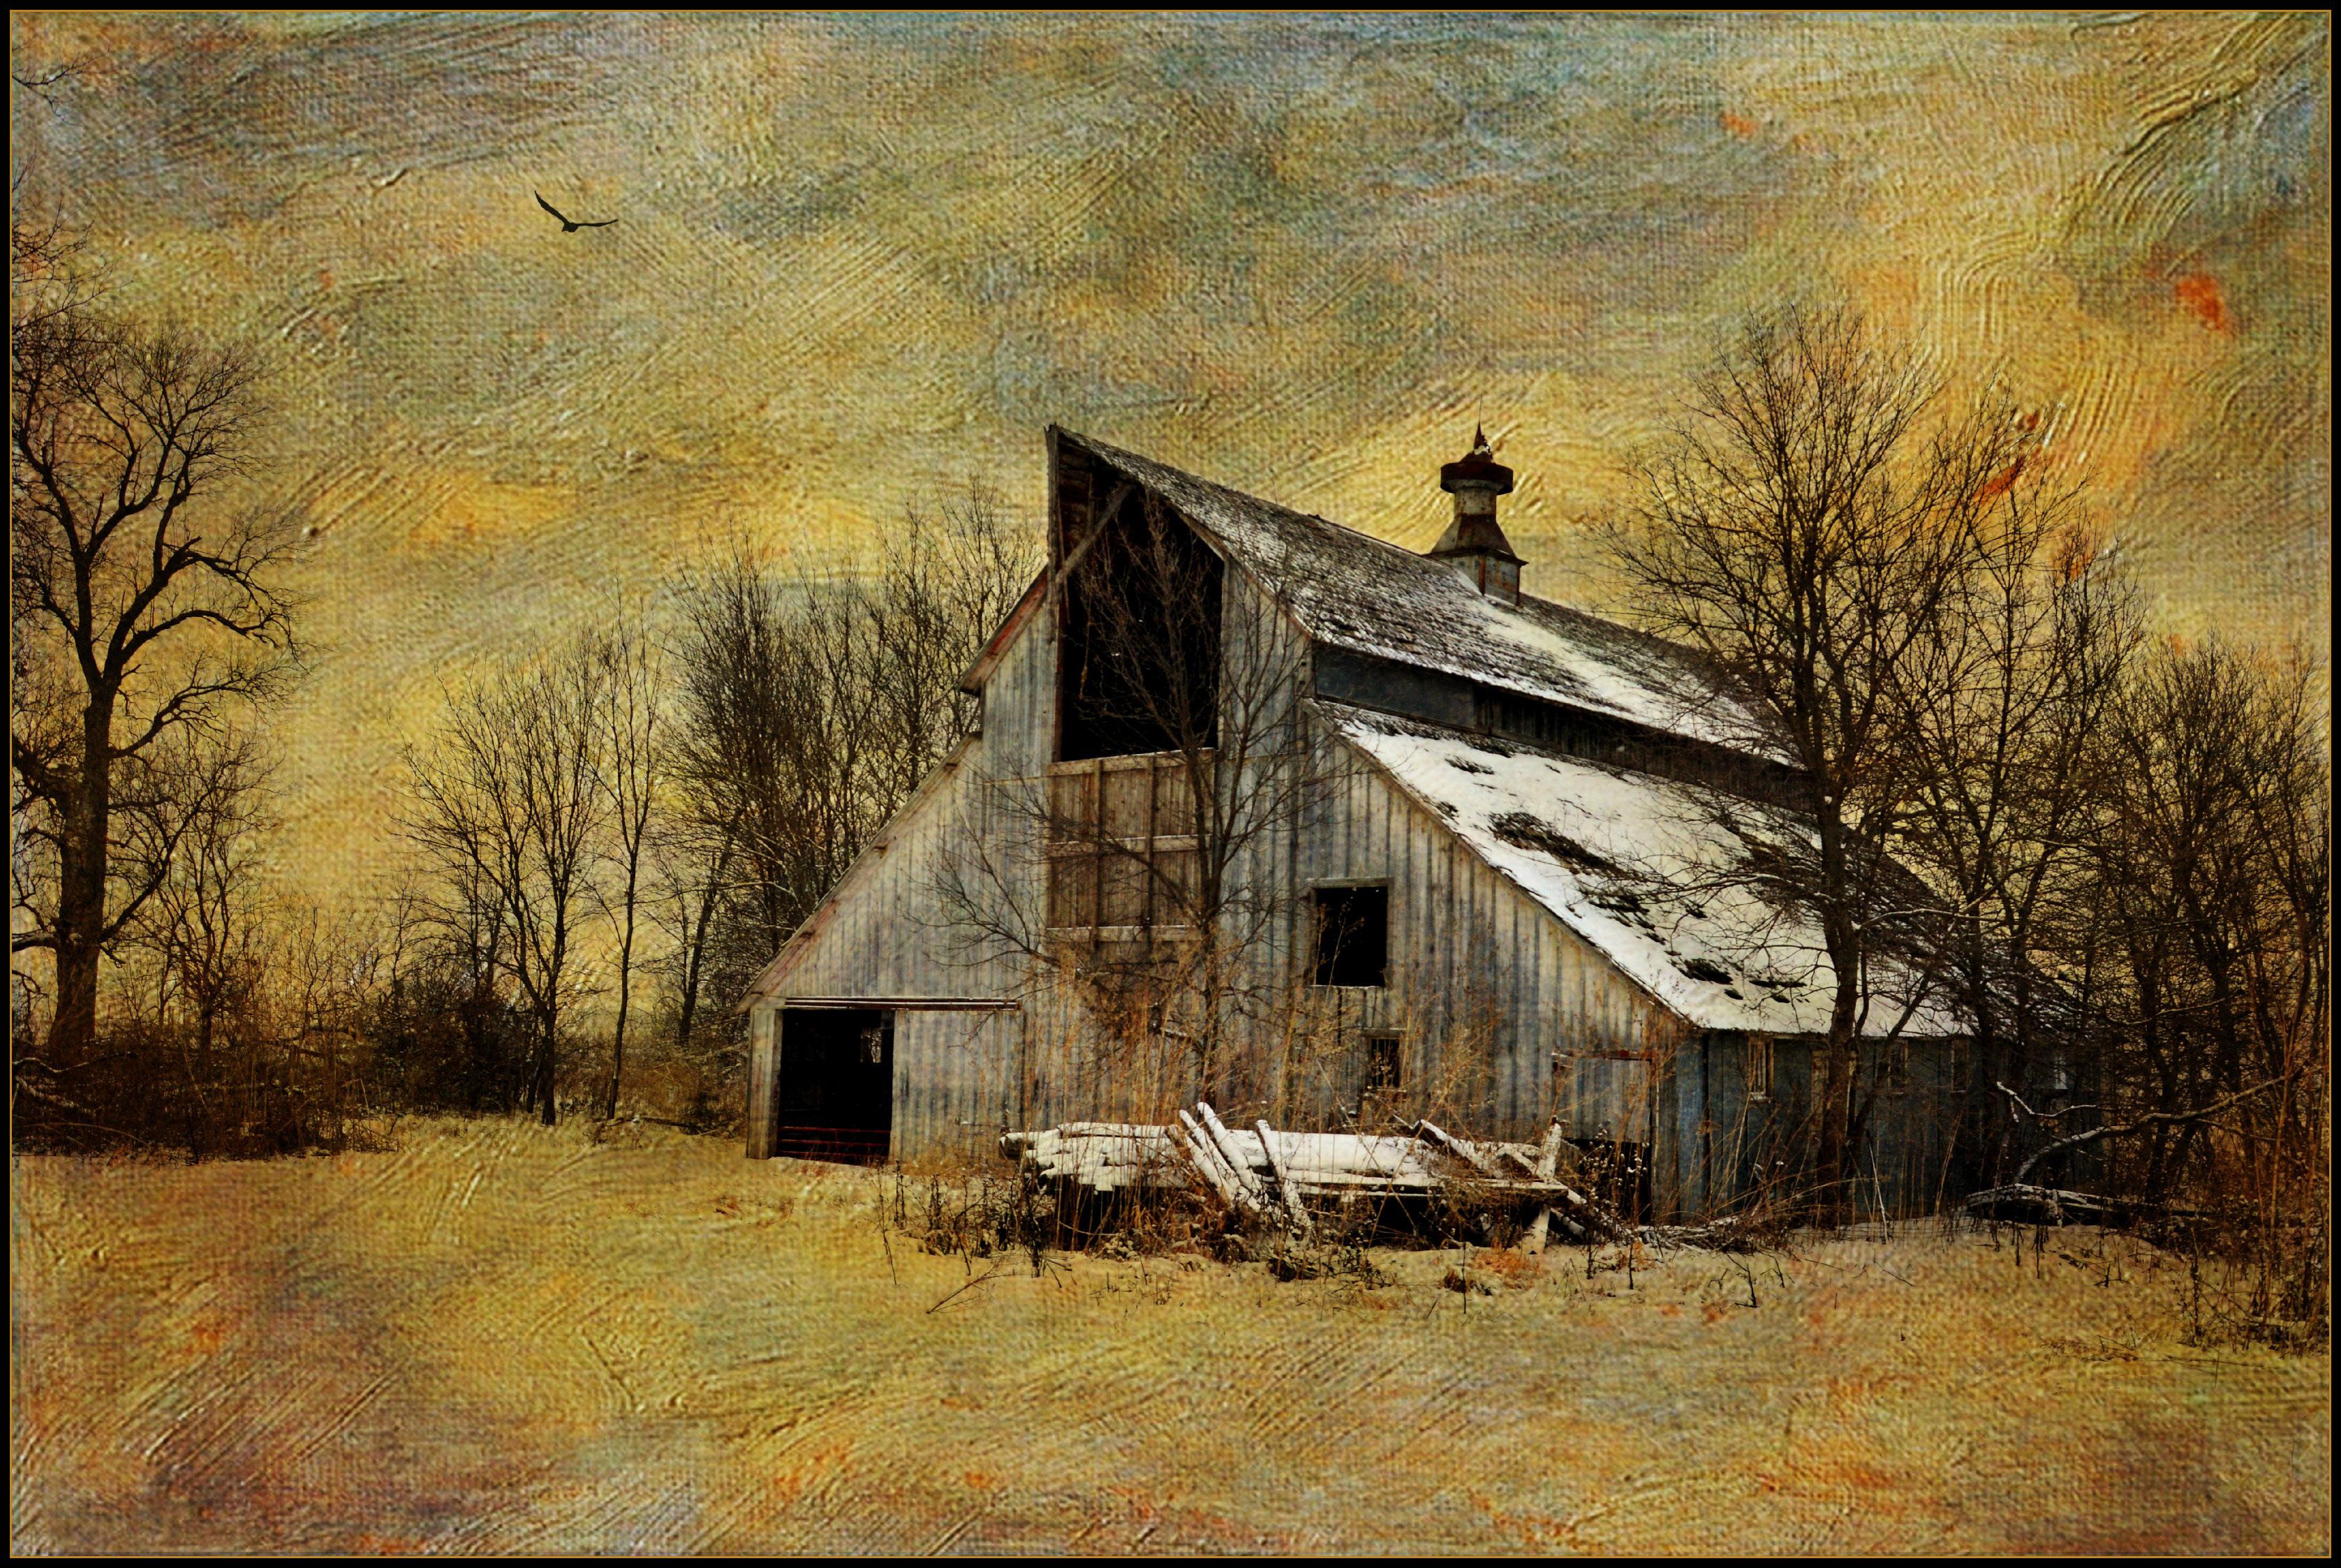 Winter Painterly Texture Abandoned Rural Nikon Farm Country Rustic Barns Iowa D3200 Memoriesbook Distressedjewellbirdbrush Lenabemanna